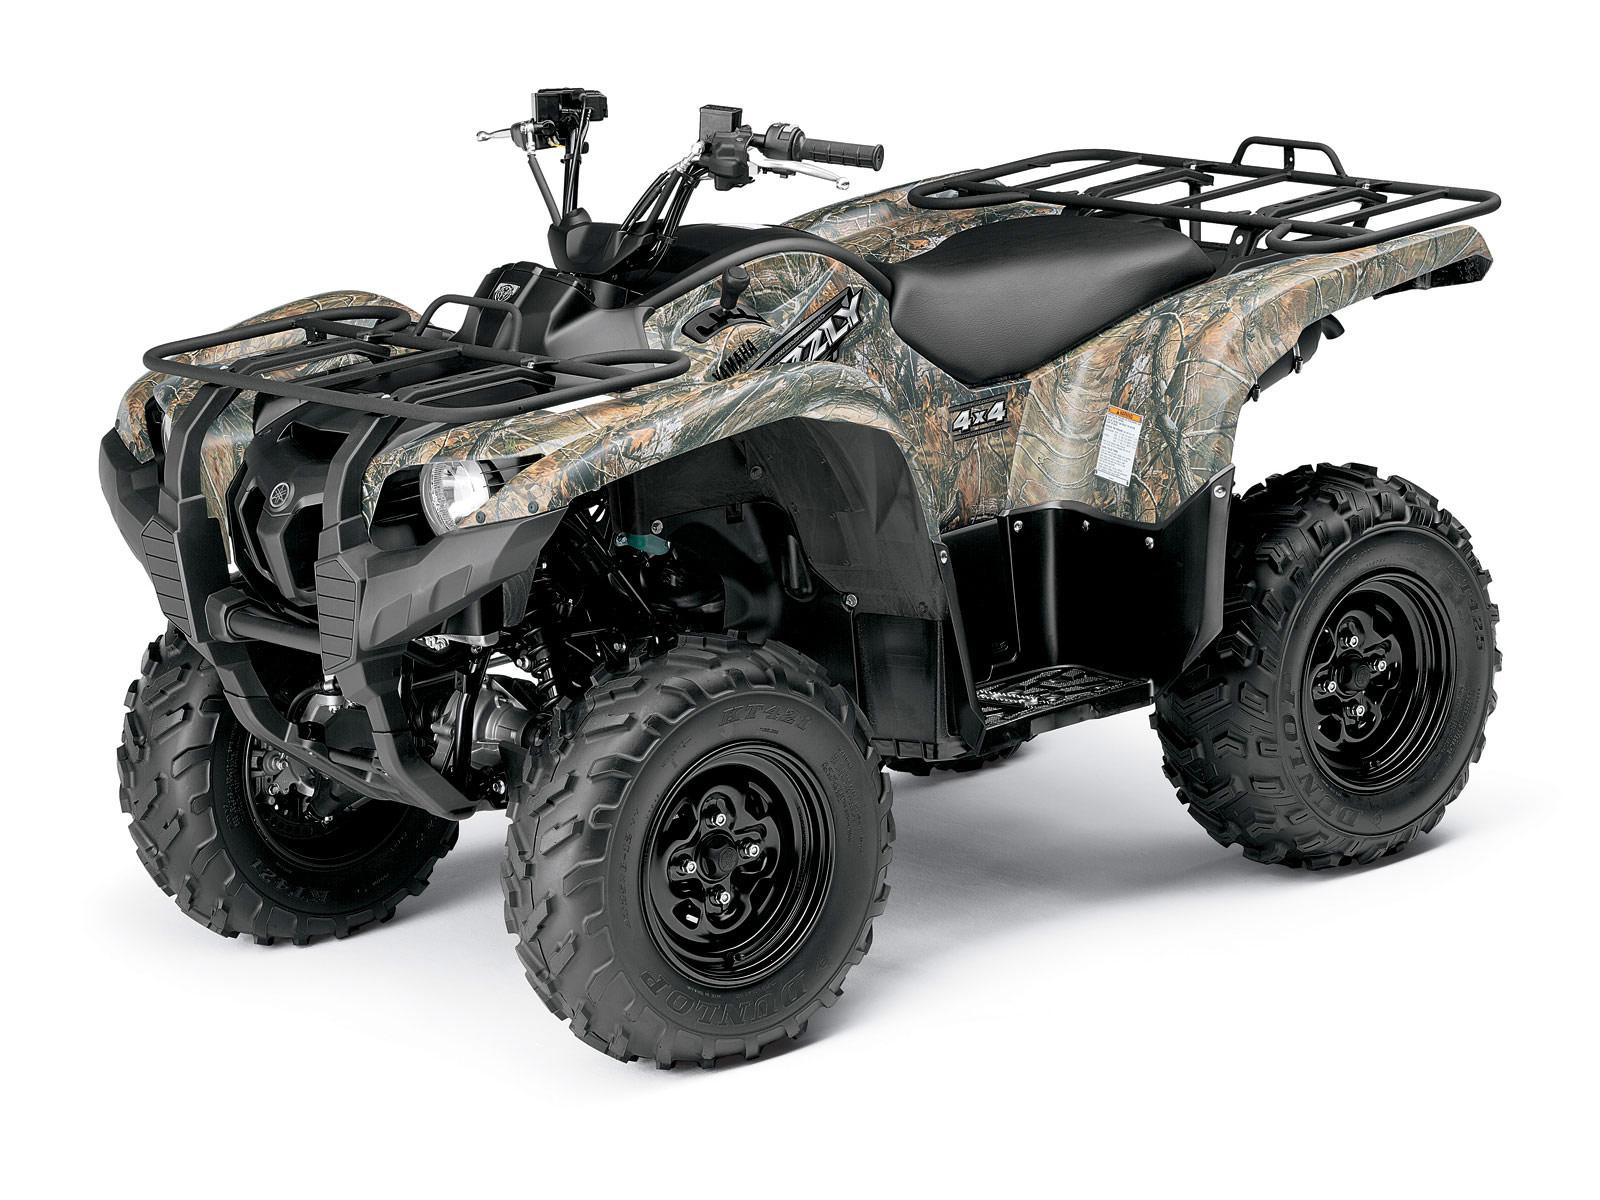 quad yamaha 850 cc